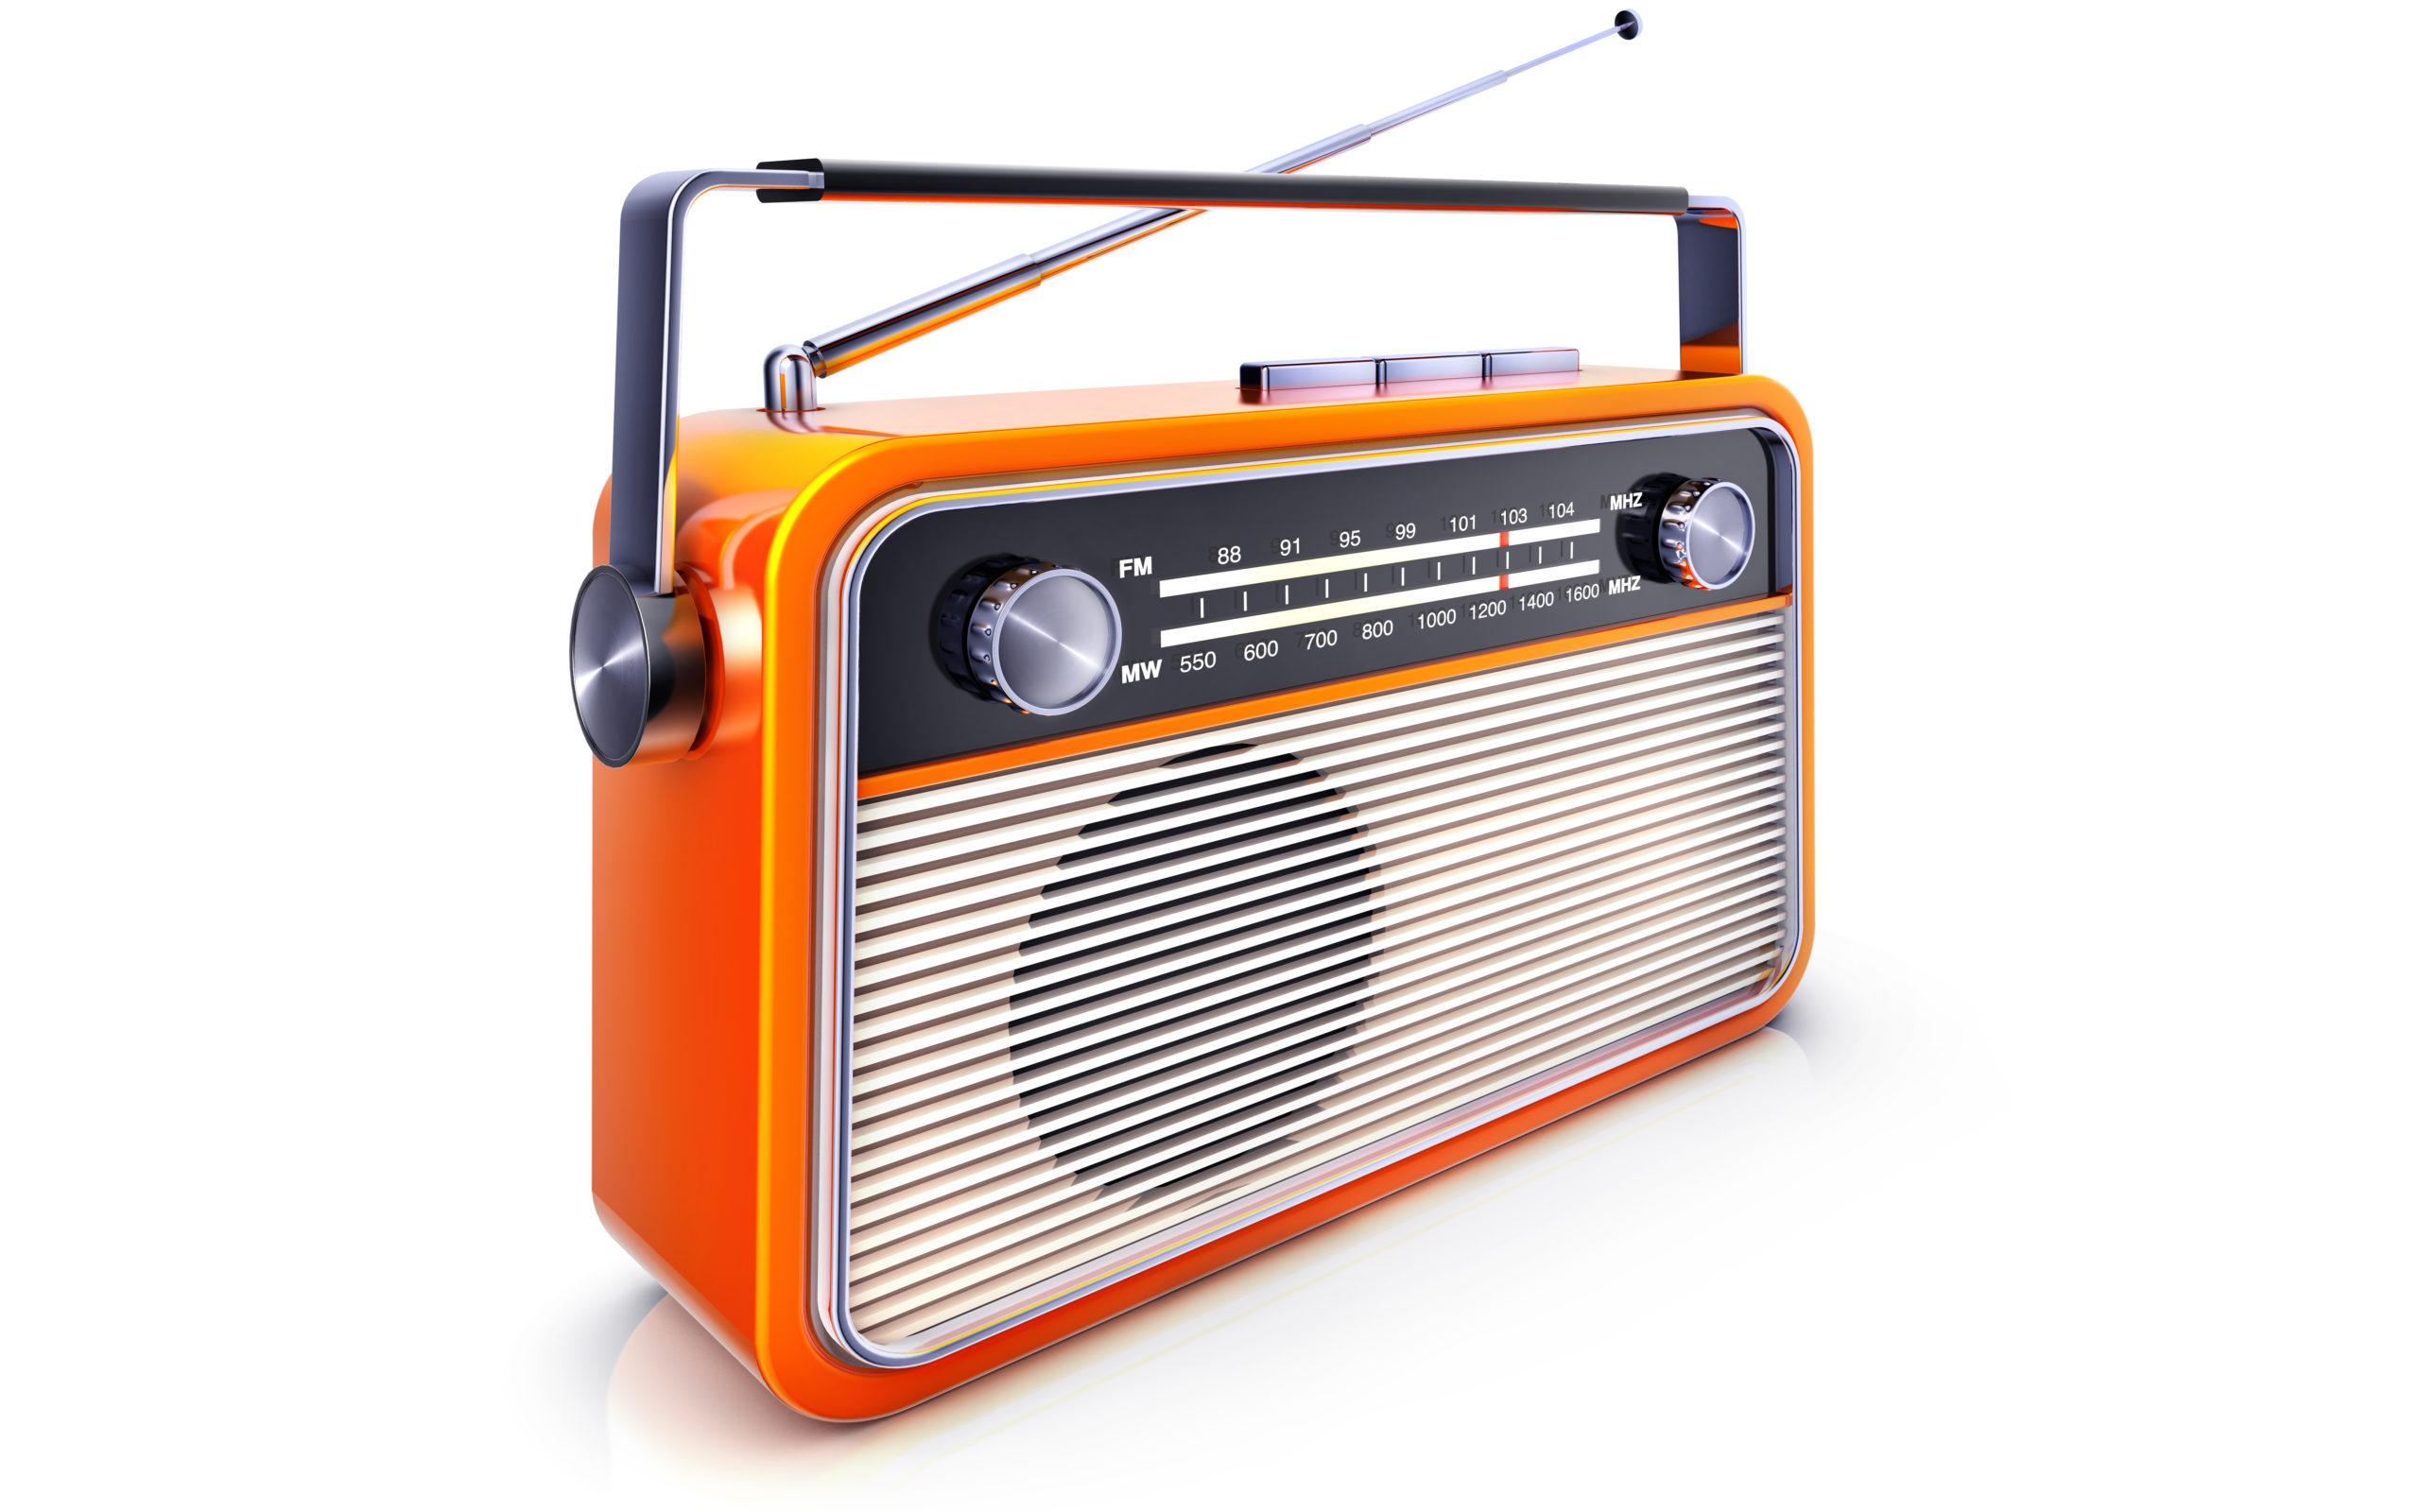 Du skal stoppe med at spille radio i din butik eller restaurant